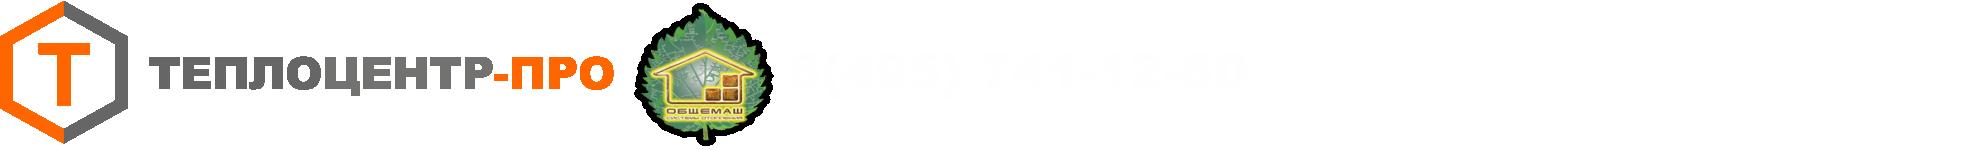 ТЕПЛОЦЕНТР.ПРО (495) 741-12-80